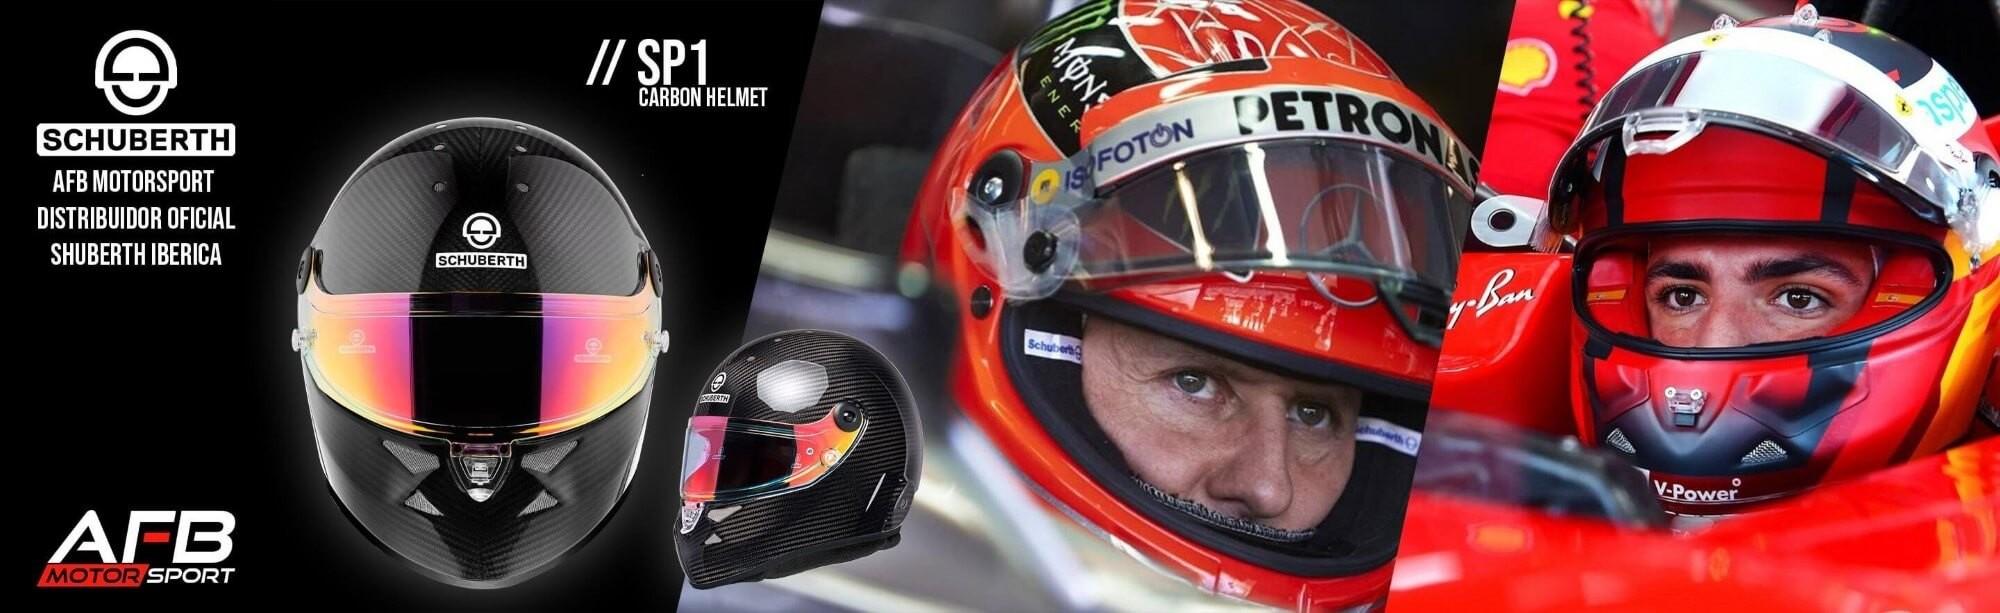 AFB Motorsport distribuidor oficial de SCHUBERTH